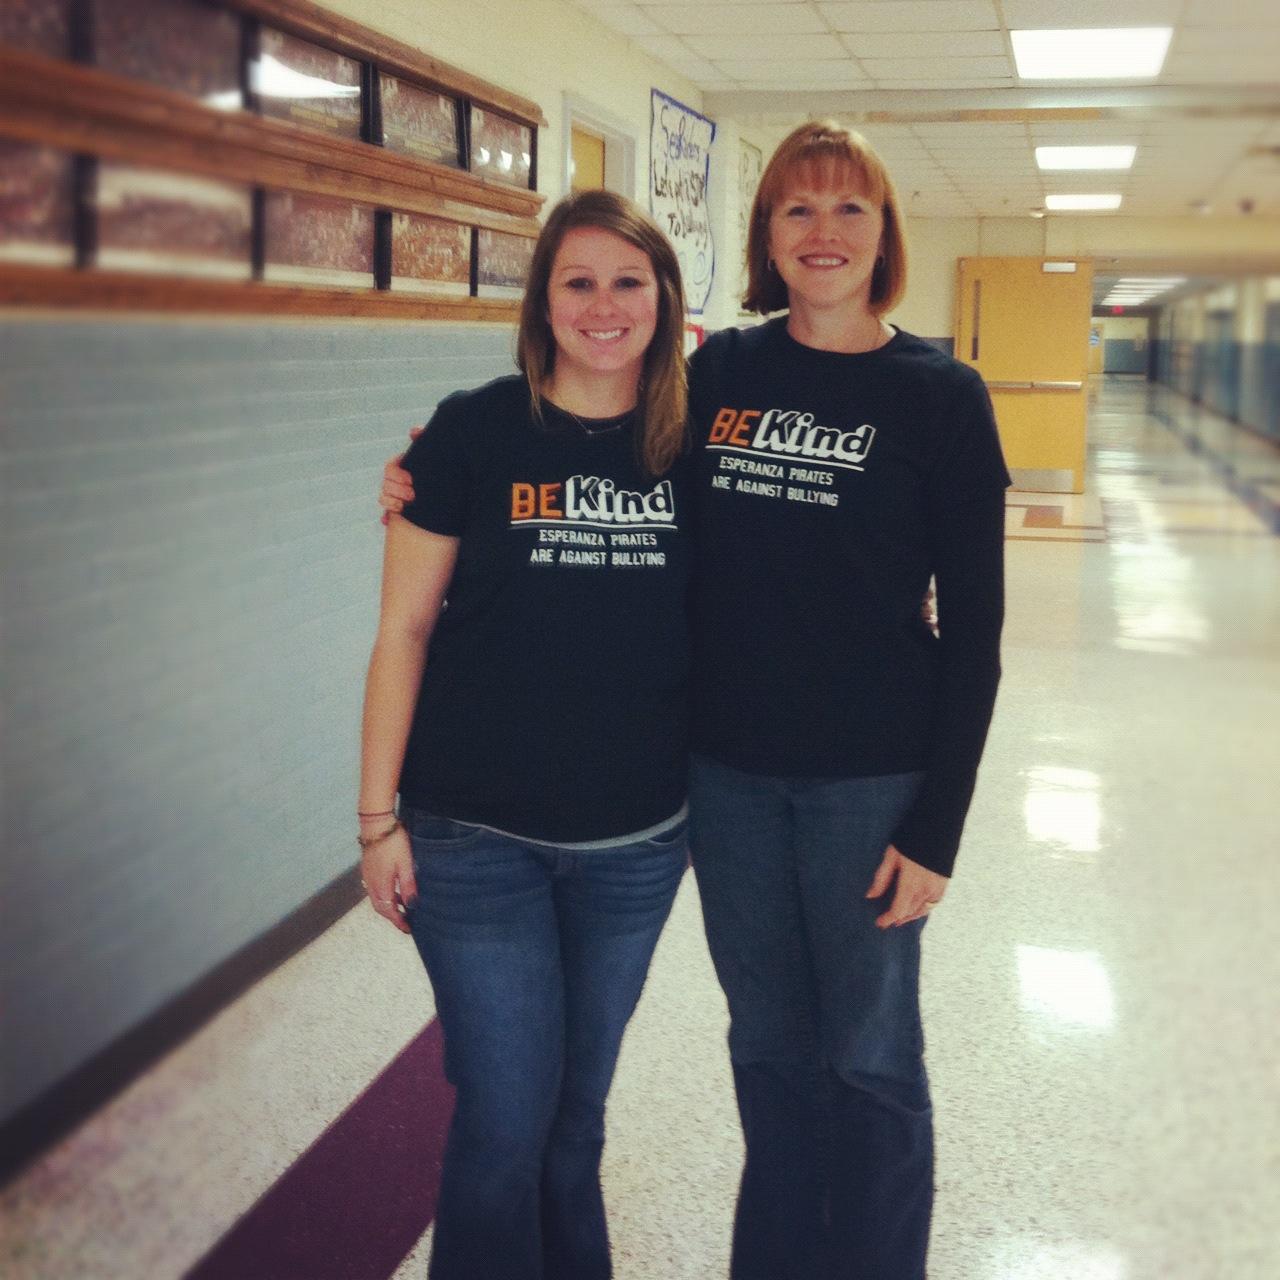 Custom T Shirts For Bully Free Shirt Design Ideas